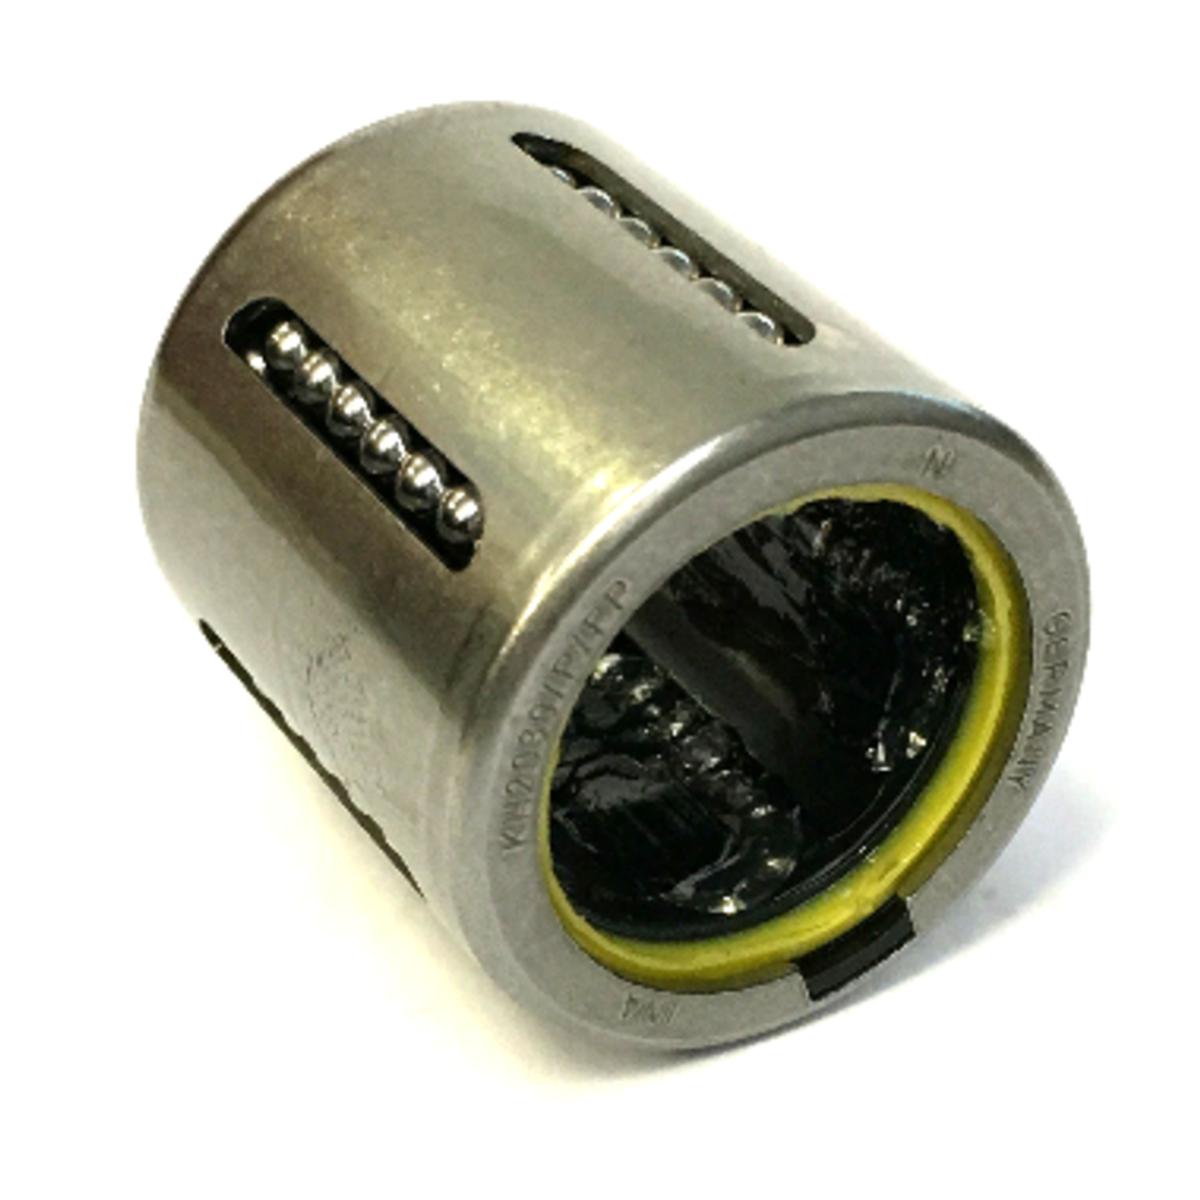 D/&D PowerDrive B66//03 Banded Belt 21//32 x 69 OC 3 Band